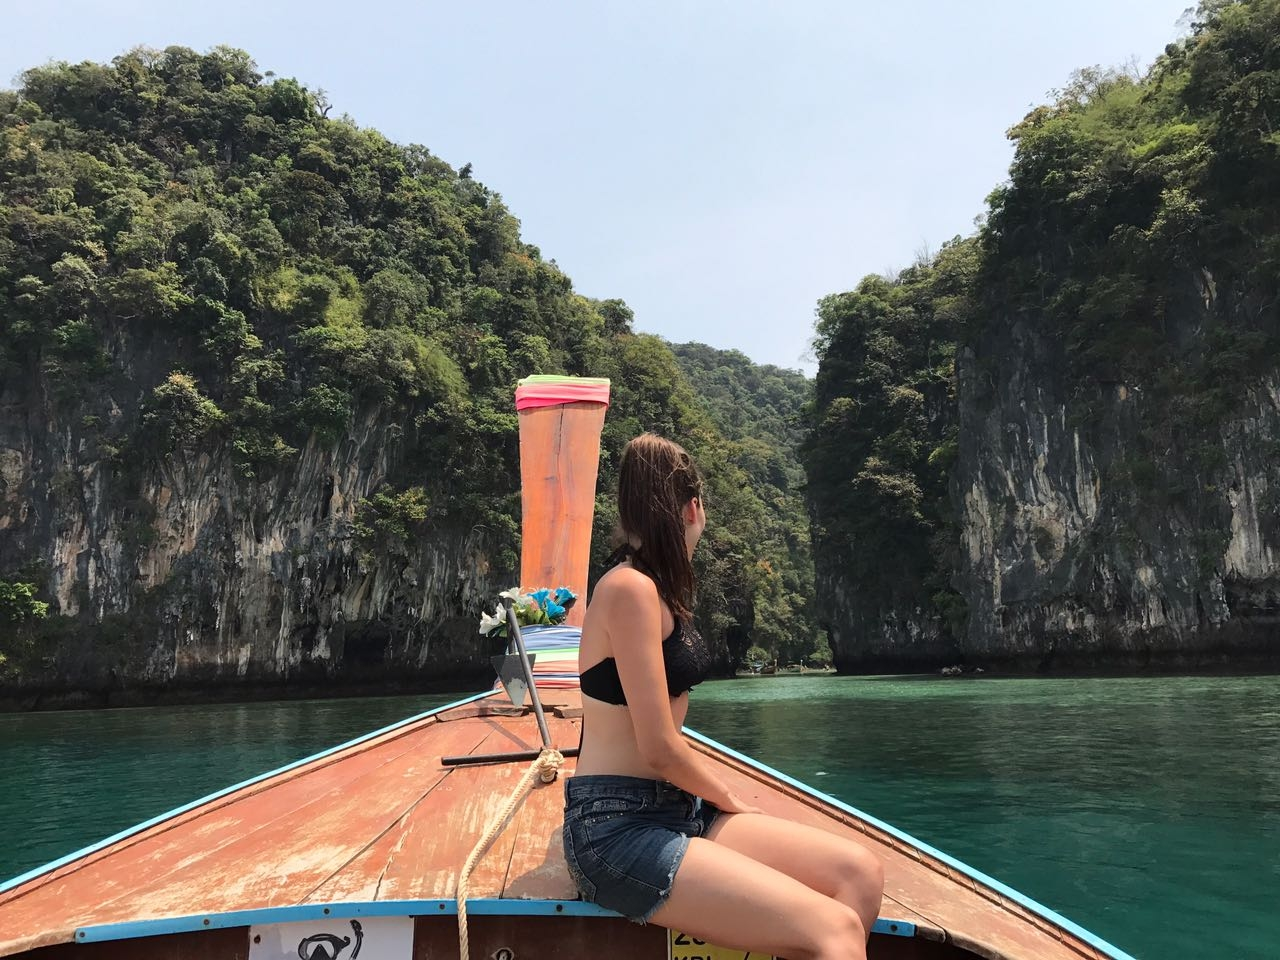 Lista Que Para A Ropa Llevar Postcards Tailandia Con Descargar 8Nn0mw